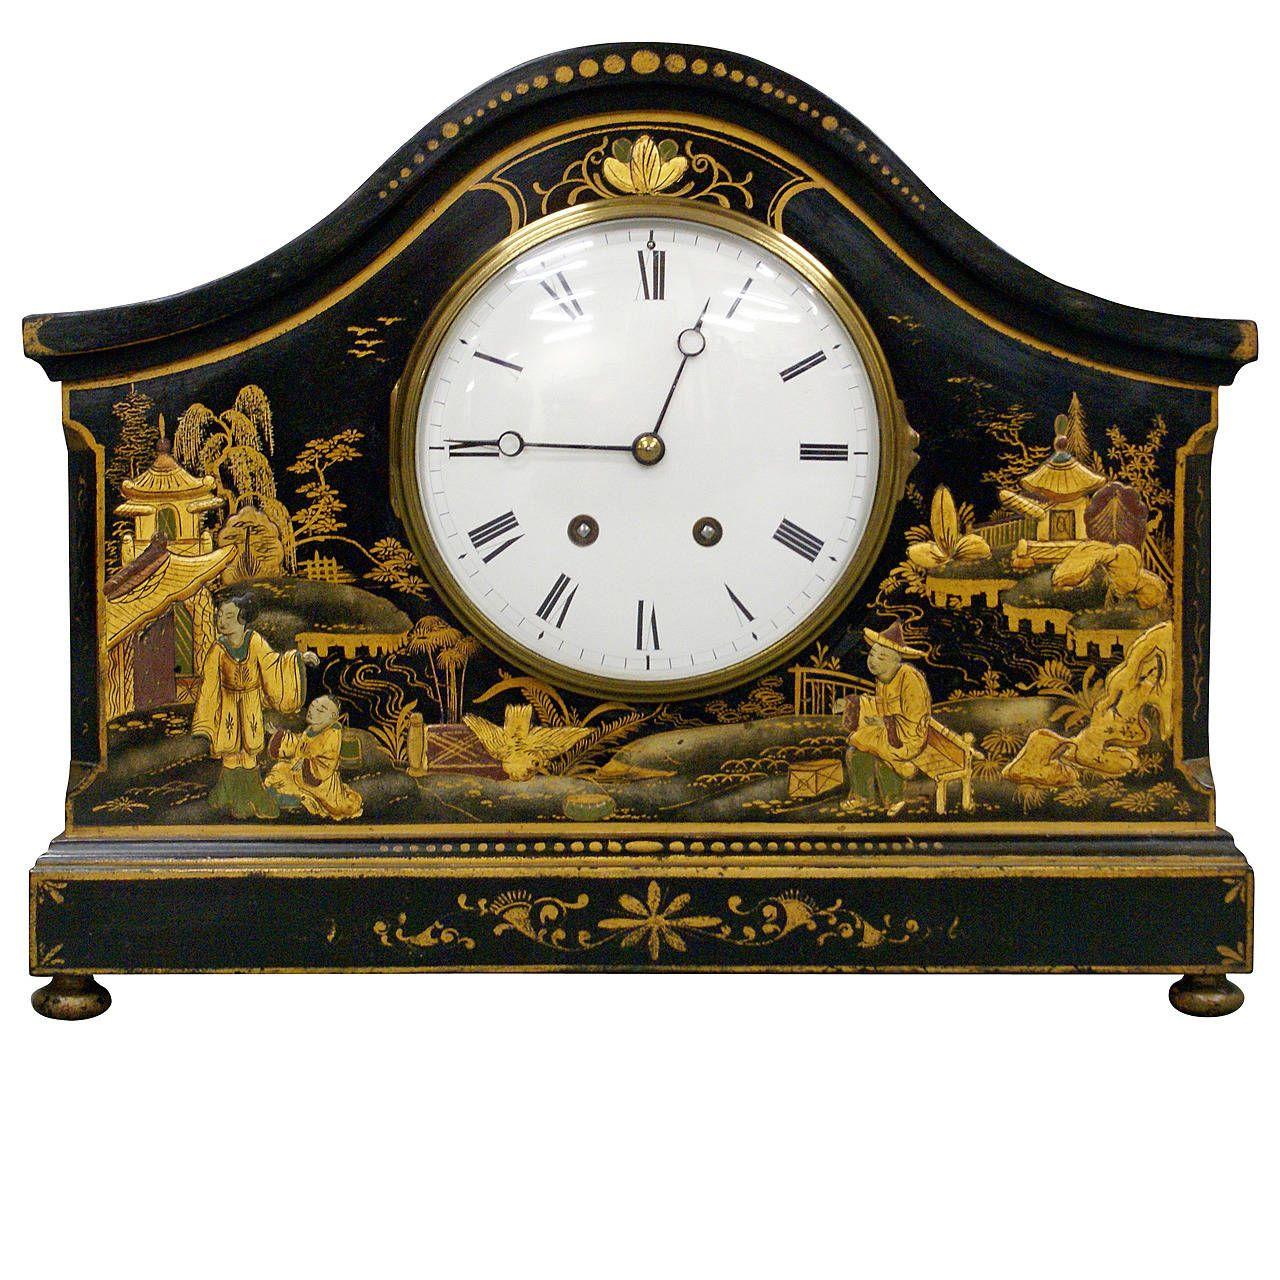 Hometime Teapot Shaped Mantel Clock